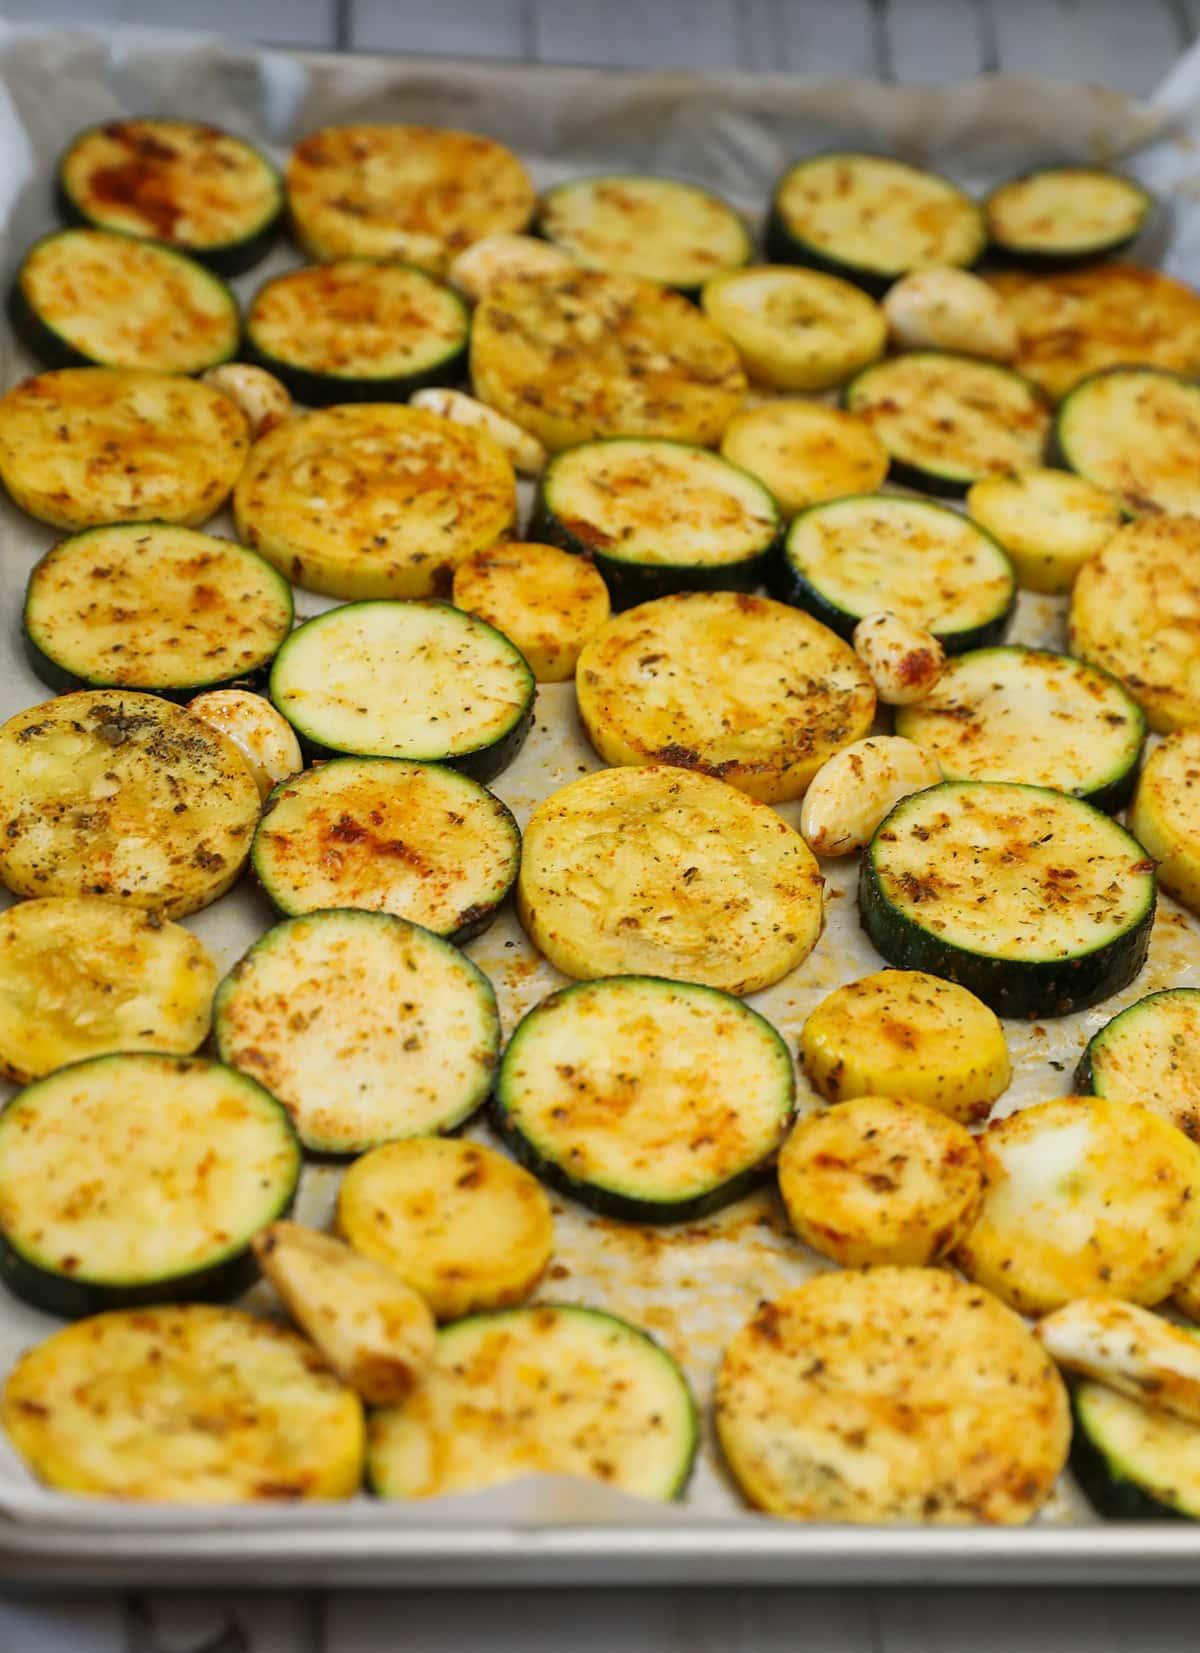 Zucchini yellow squash on baking tray